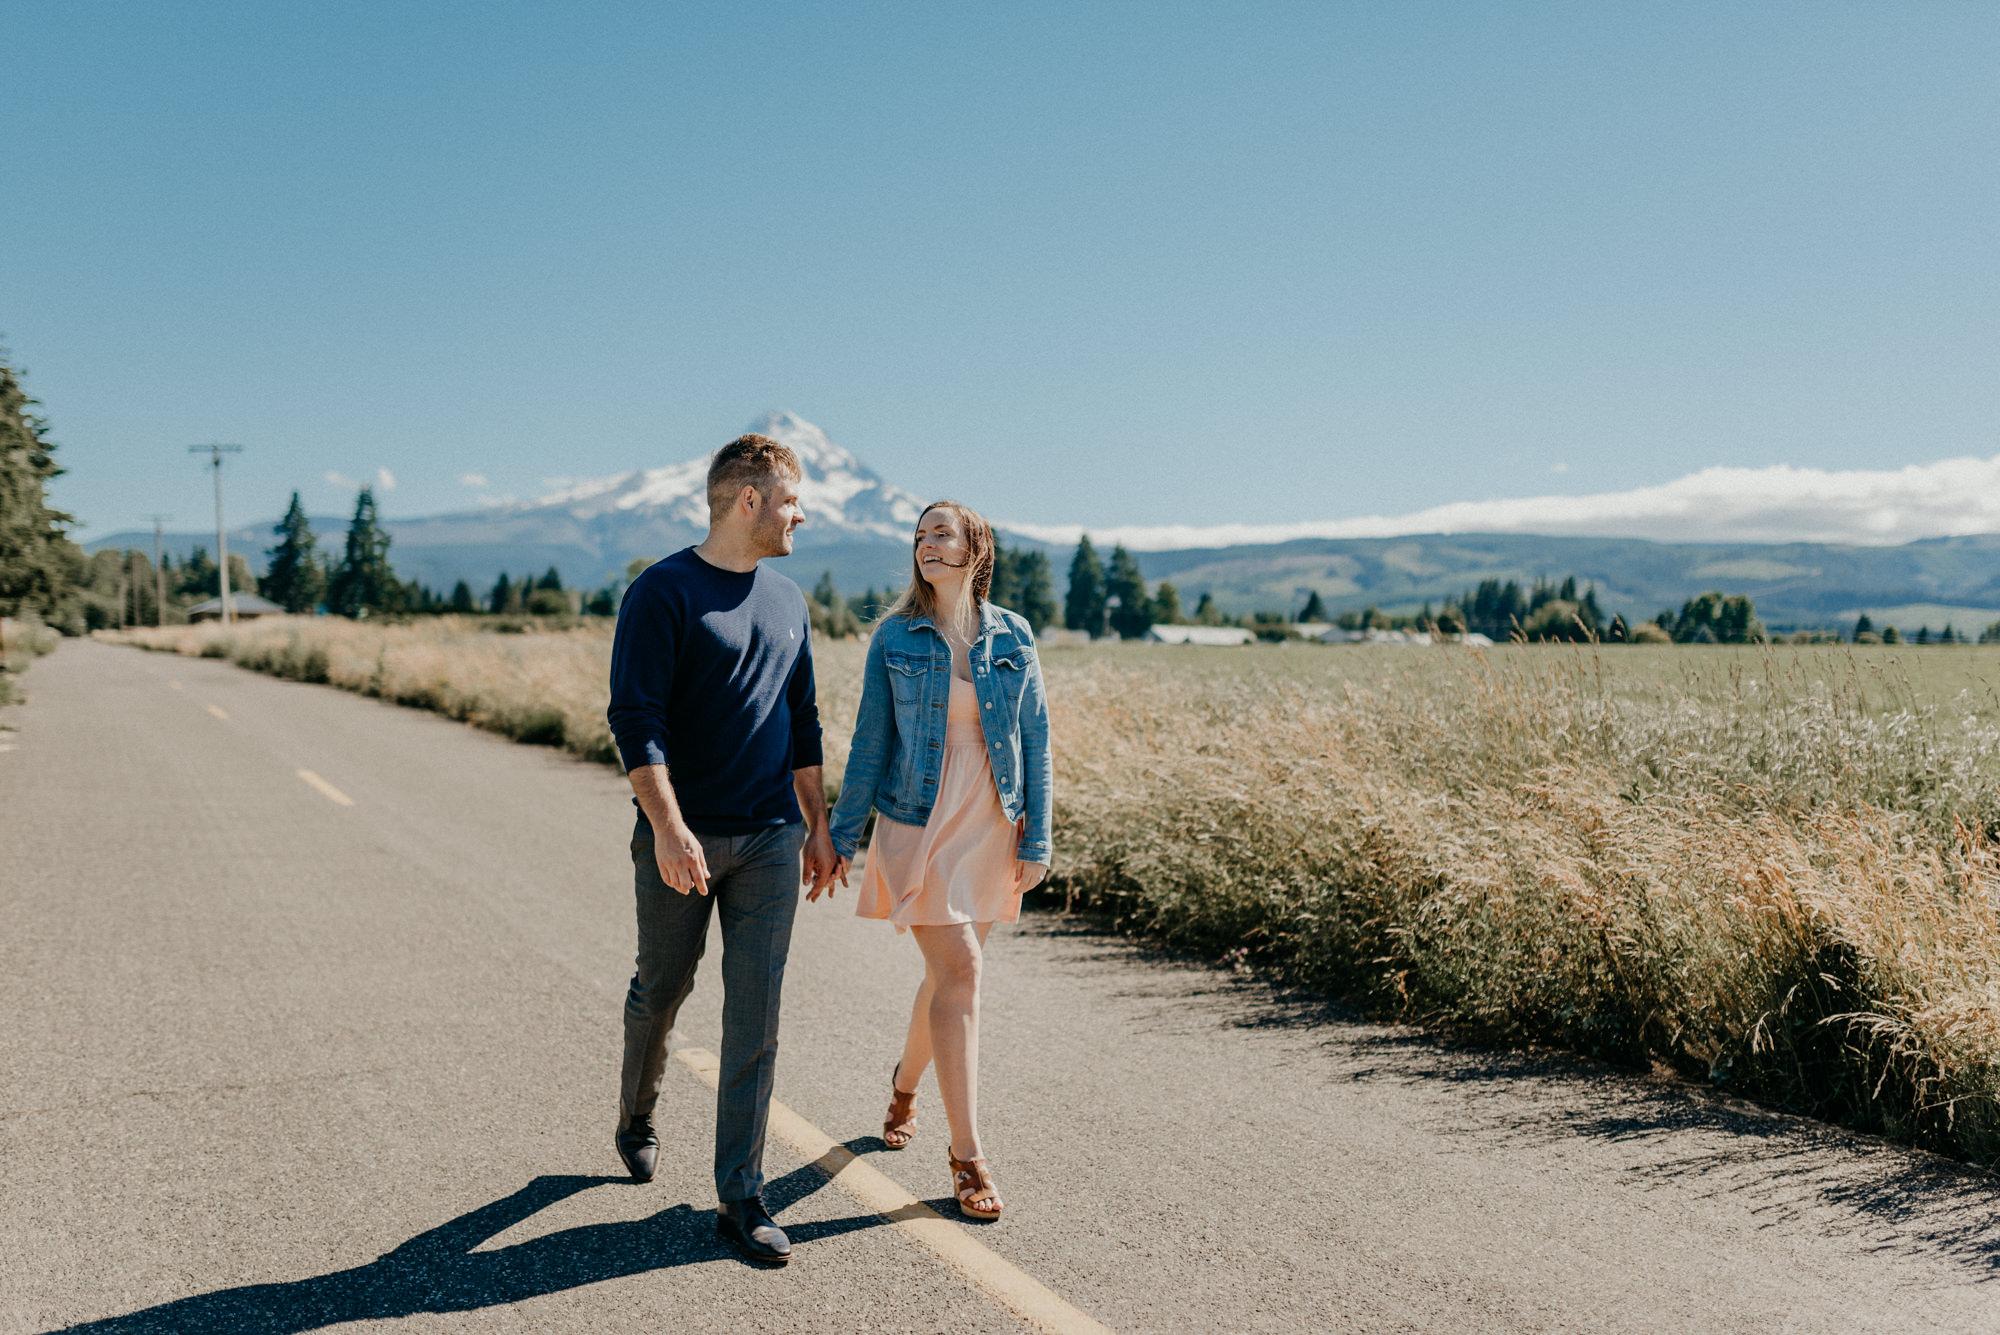 15-Mt-hood-lavender-farms-engagment-couple-summer-7436.jpg